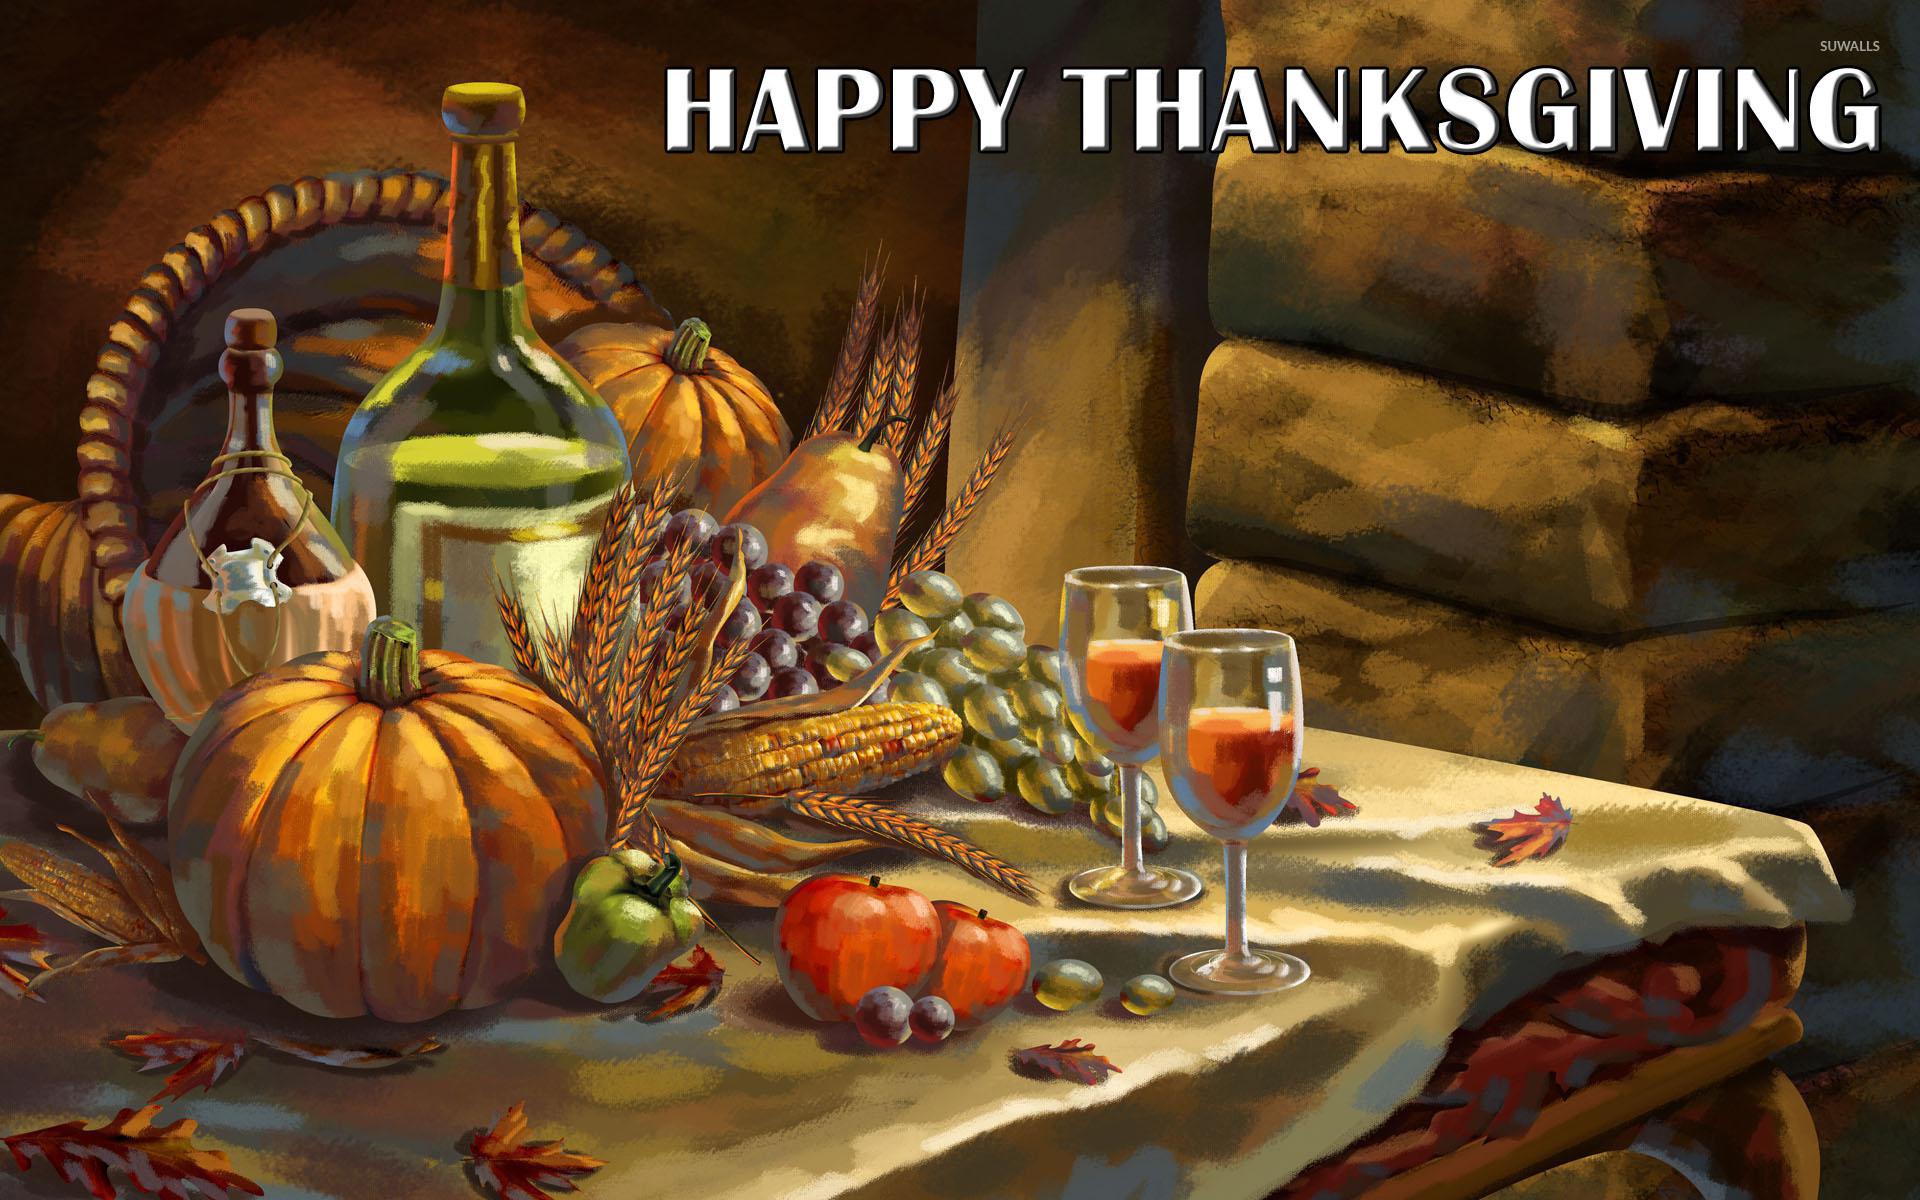 Thanksgiving wallpaper – Holiday wallpapers – #8797